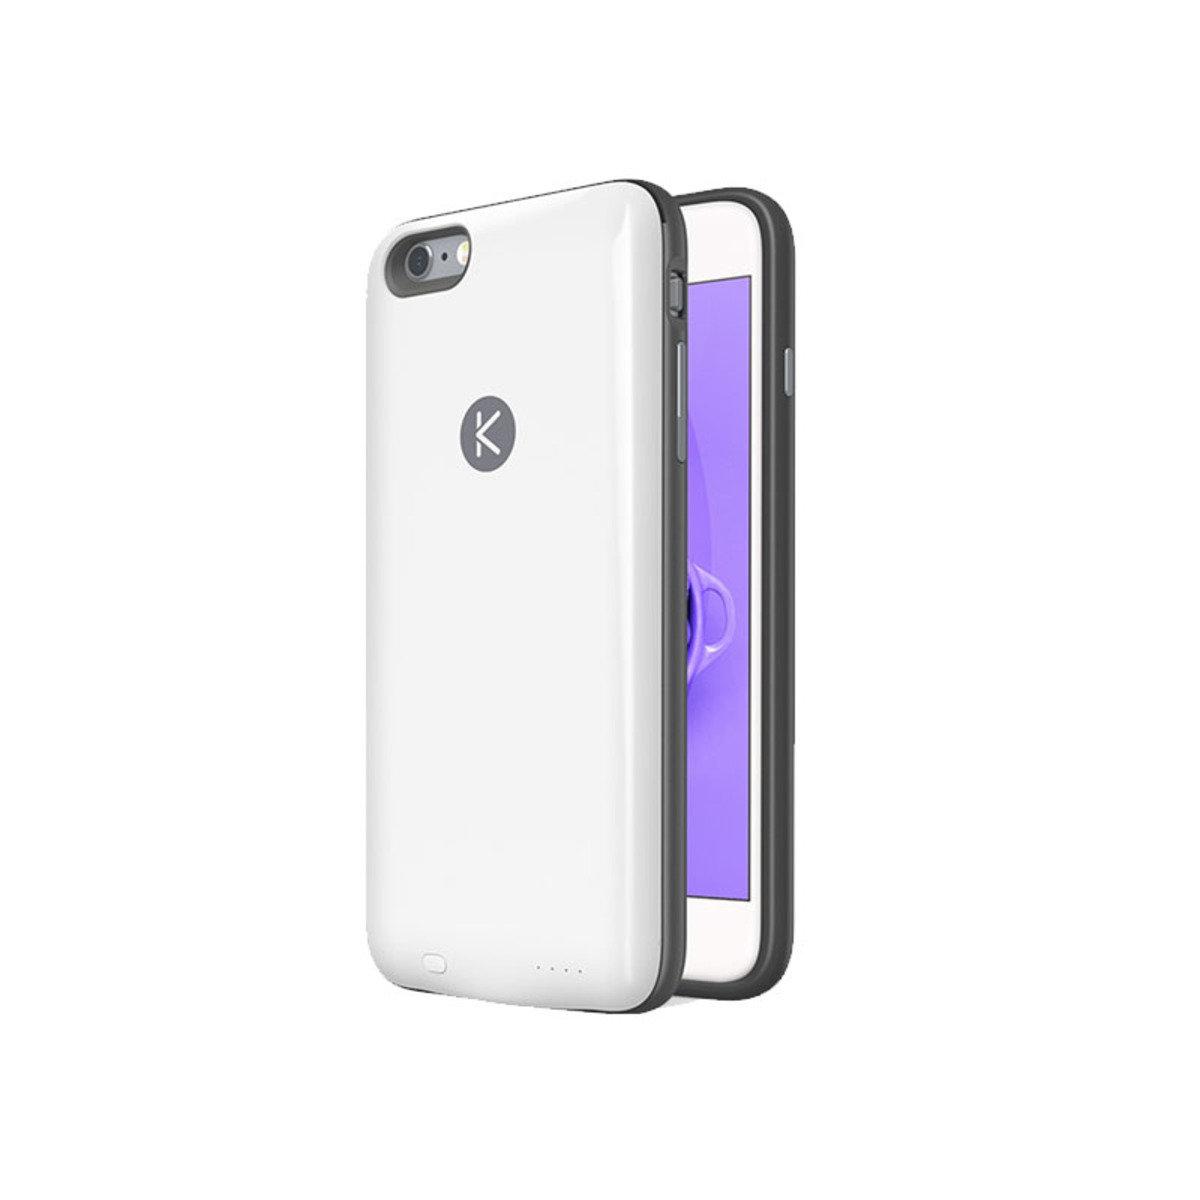 iPhone 6 Plus / 6S Plus專用機殼內置16GB連2400mAh充電池 黑色+白色 I6PBW16